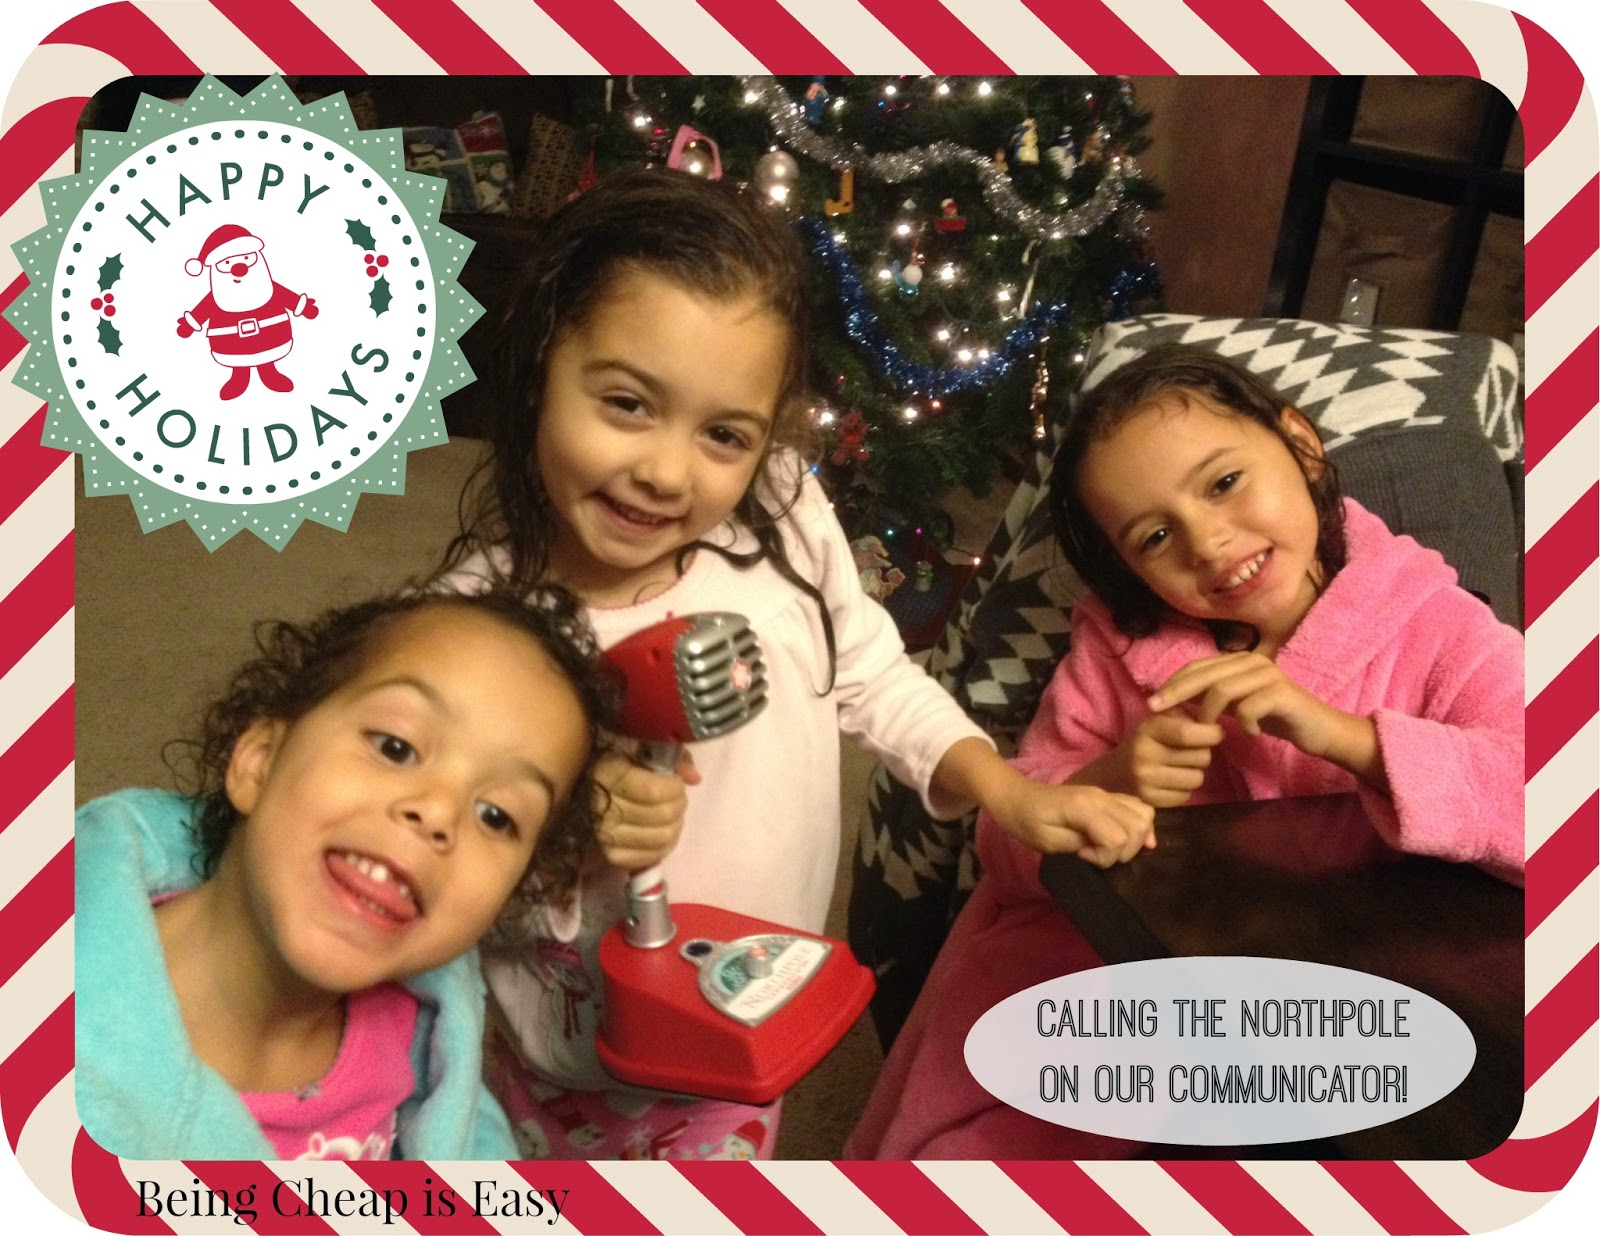 Hallmark, Northpole movie, #NorthpoleFun, Walmart, Christmas traditions, #Ad, #Cbias